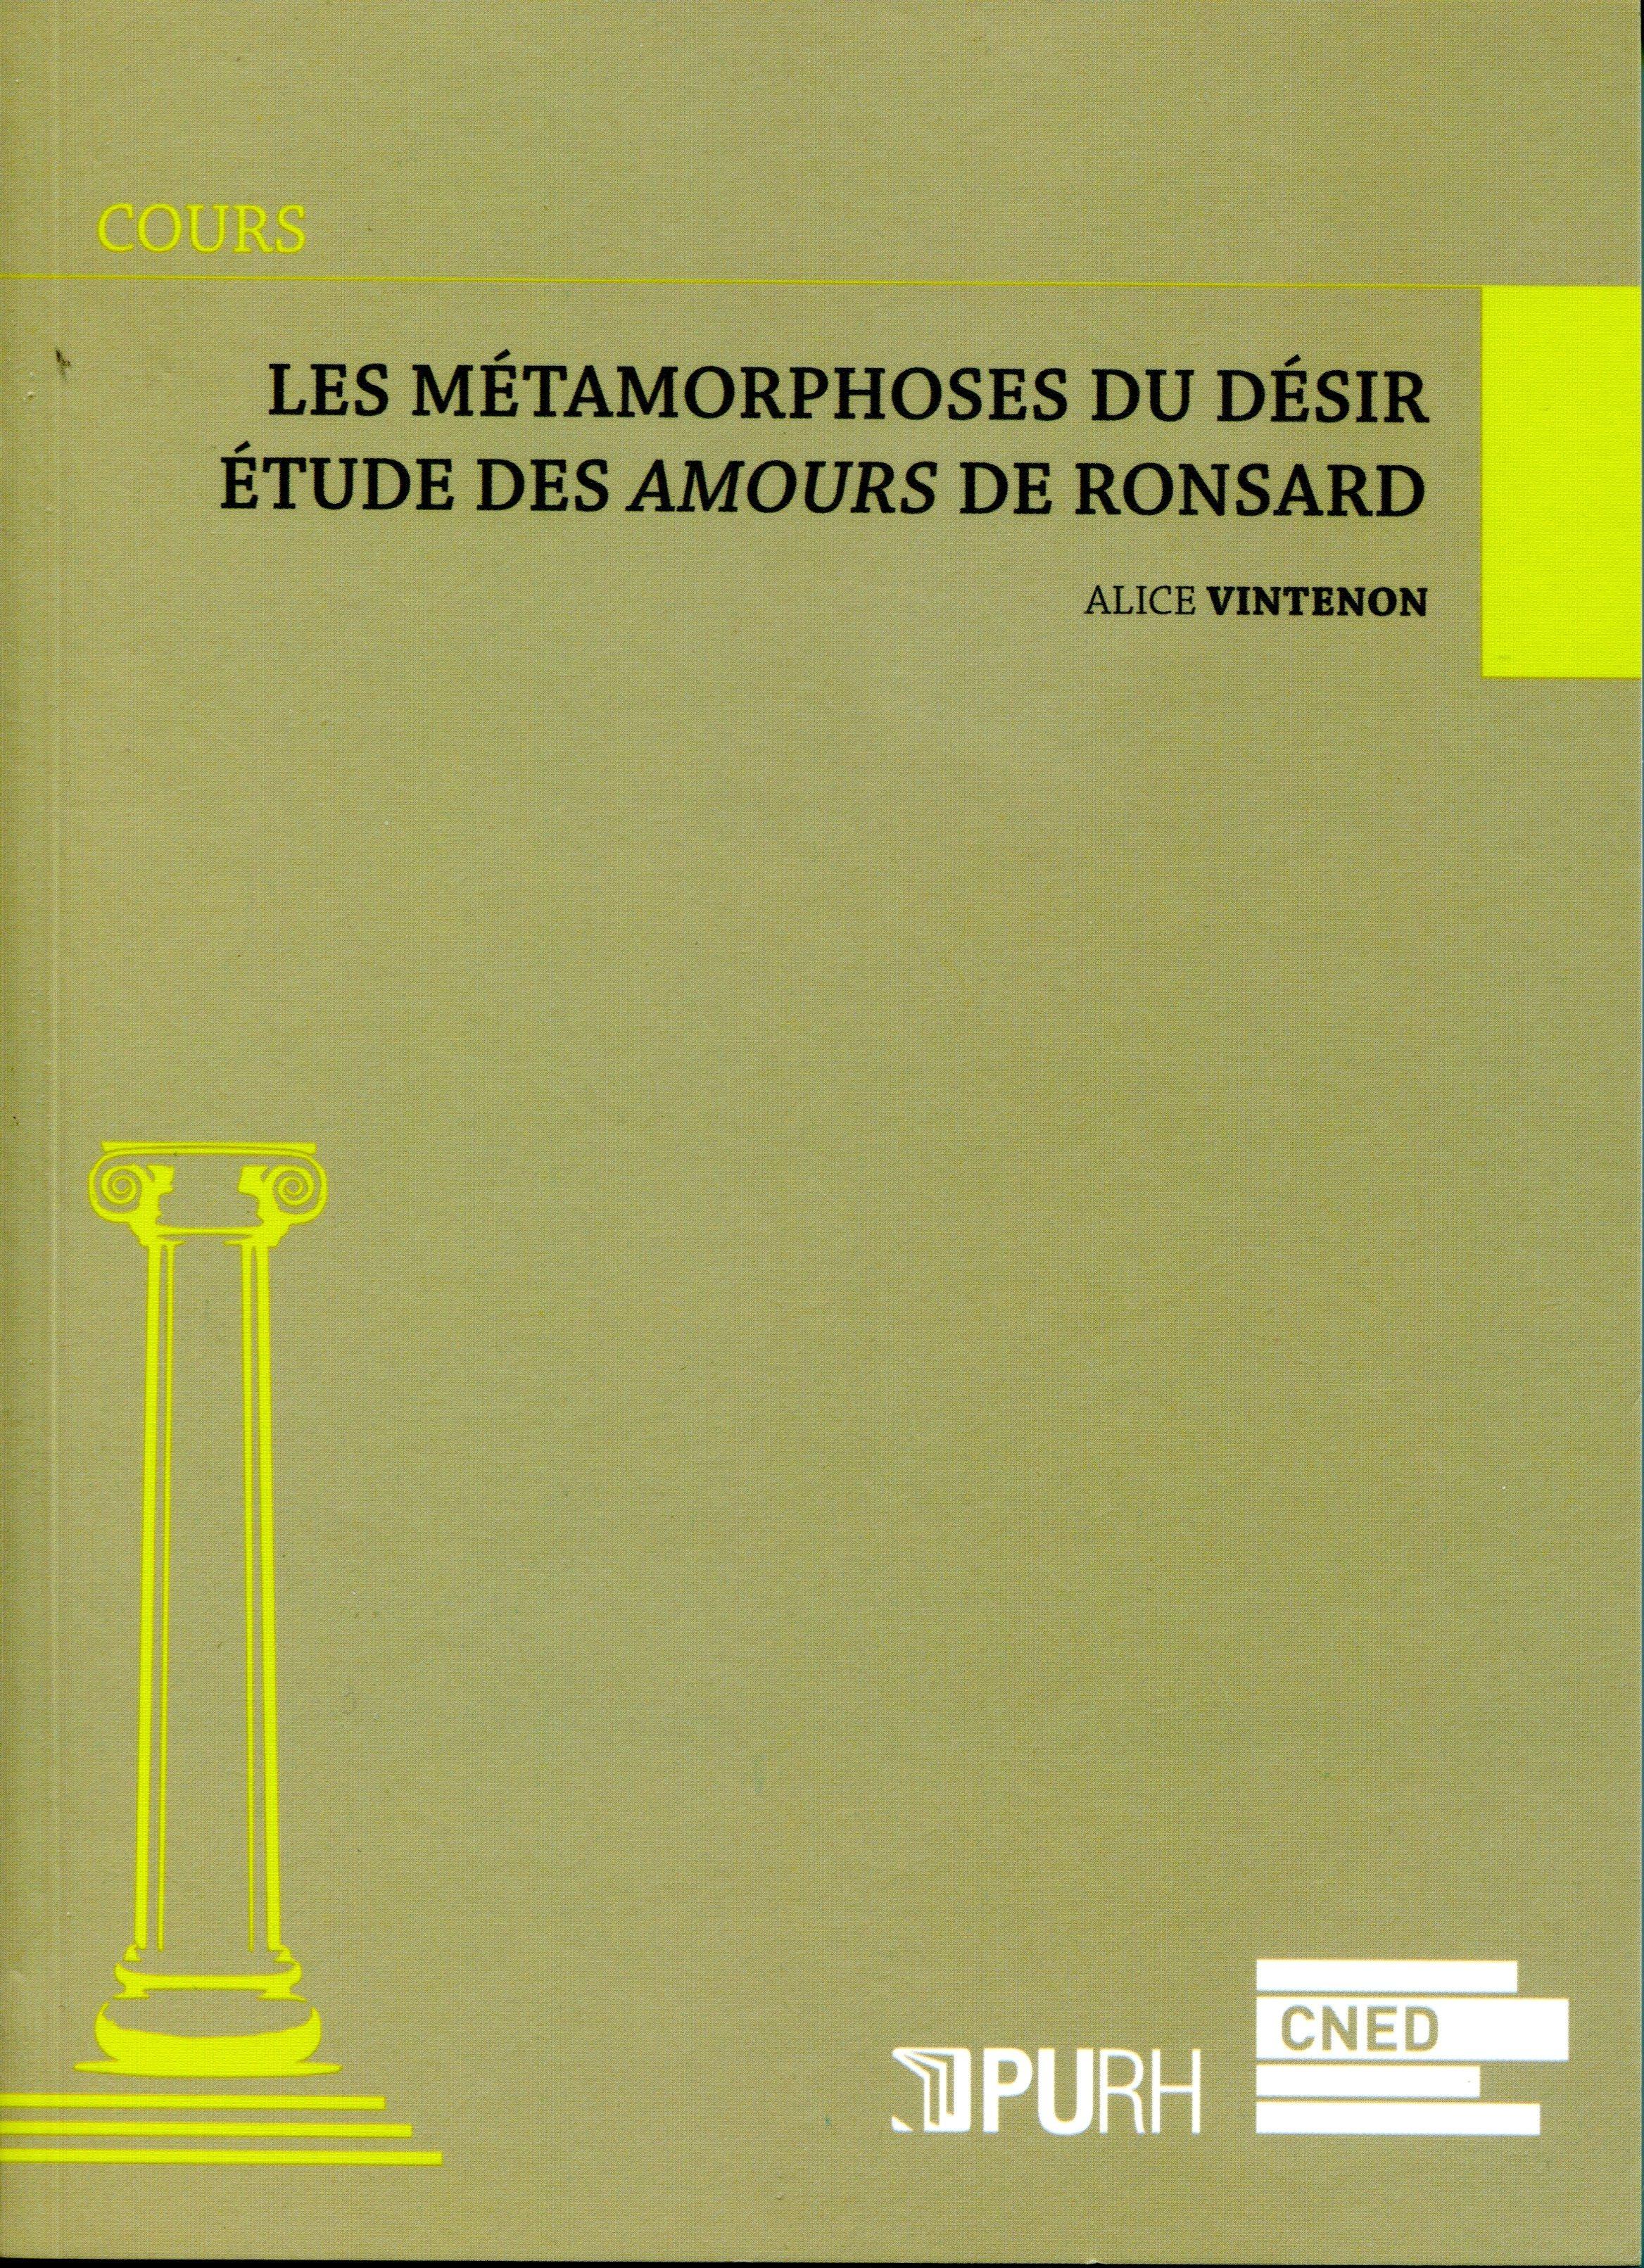 Les metamorphoses du desir. etude des <i>amours de cassandre</i> de r onsard